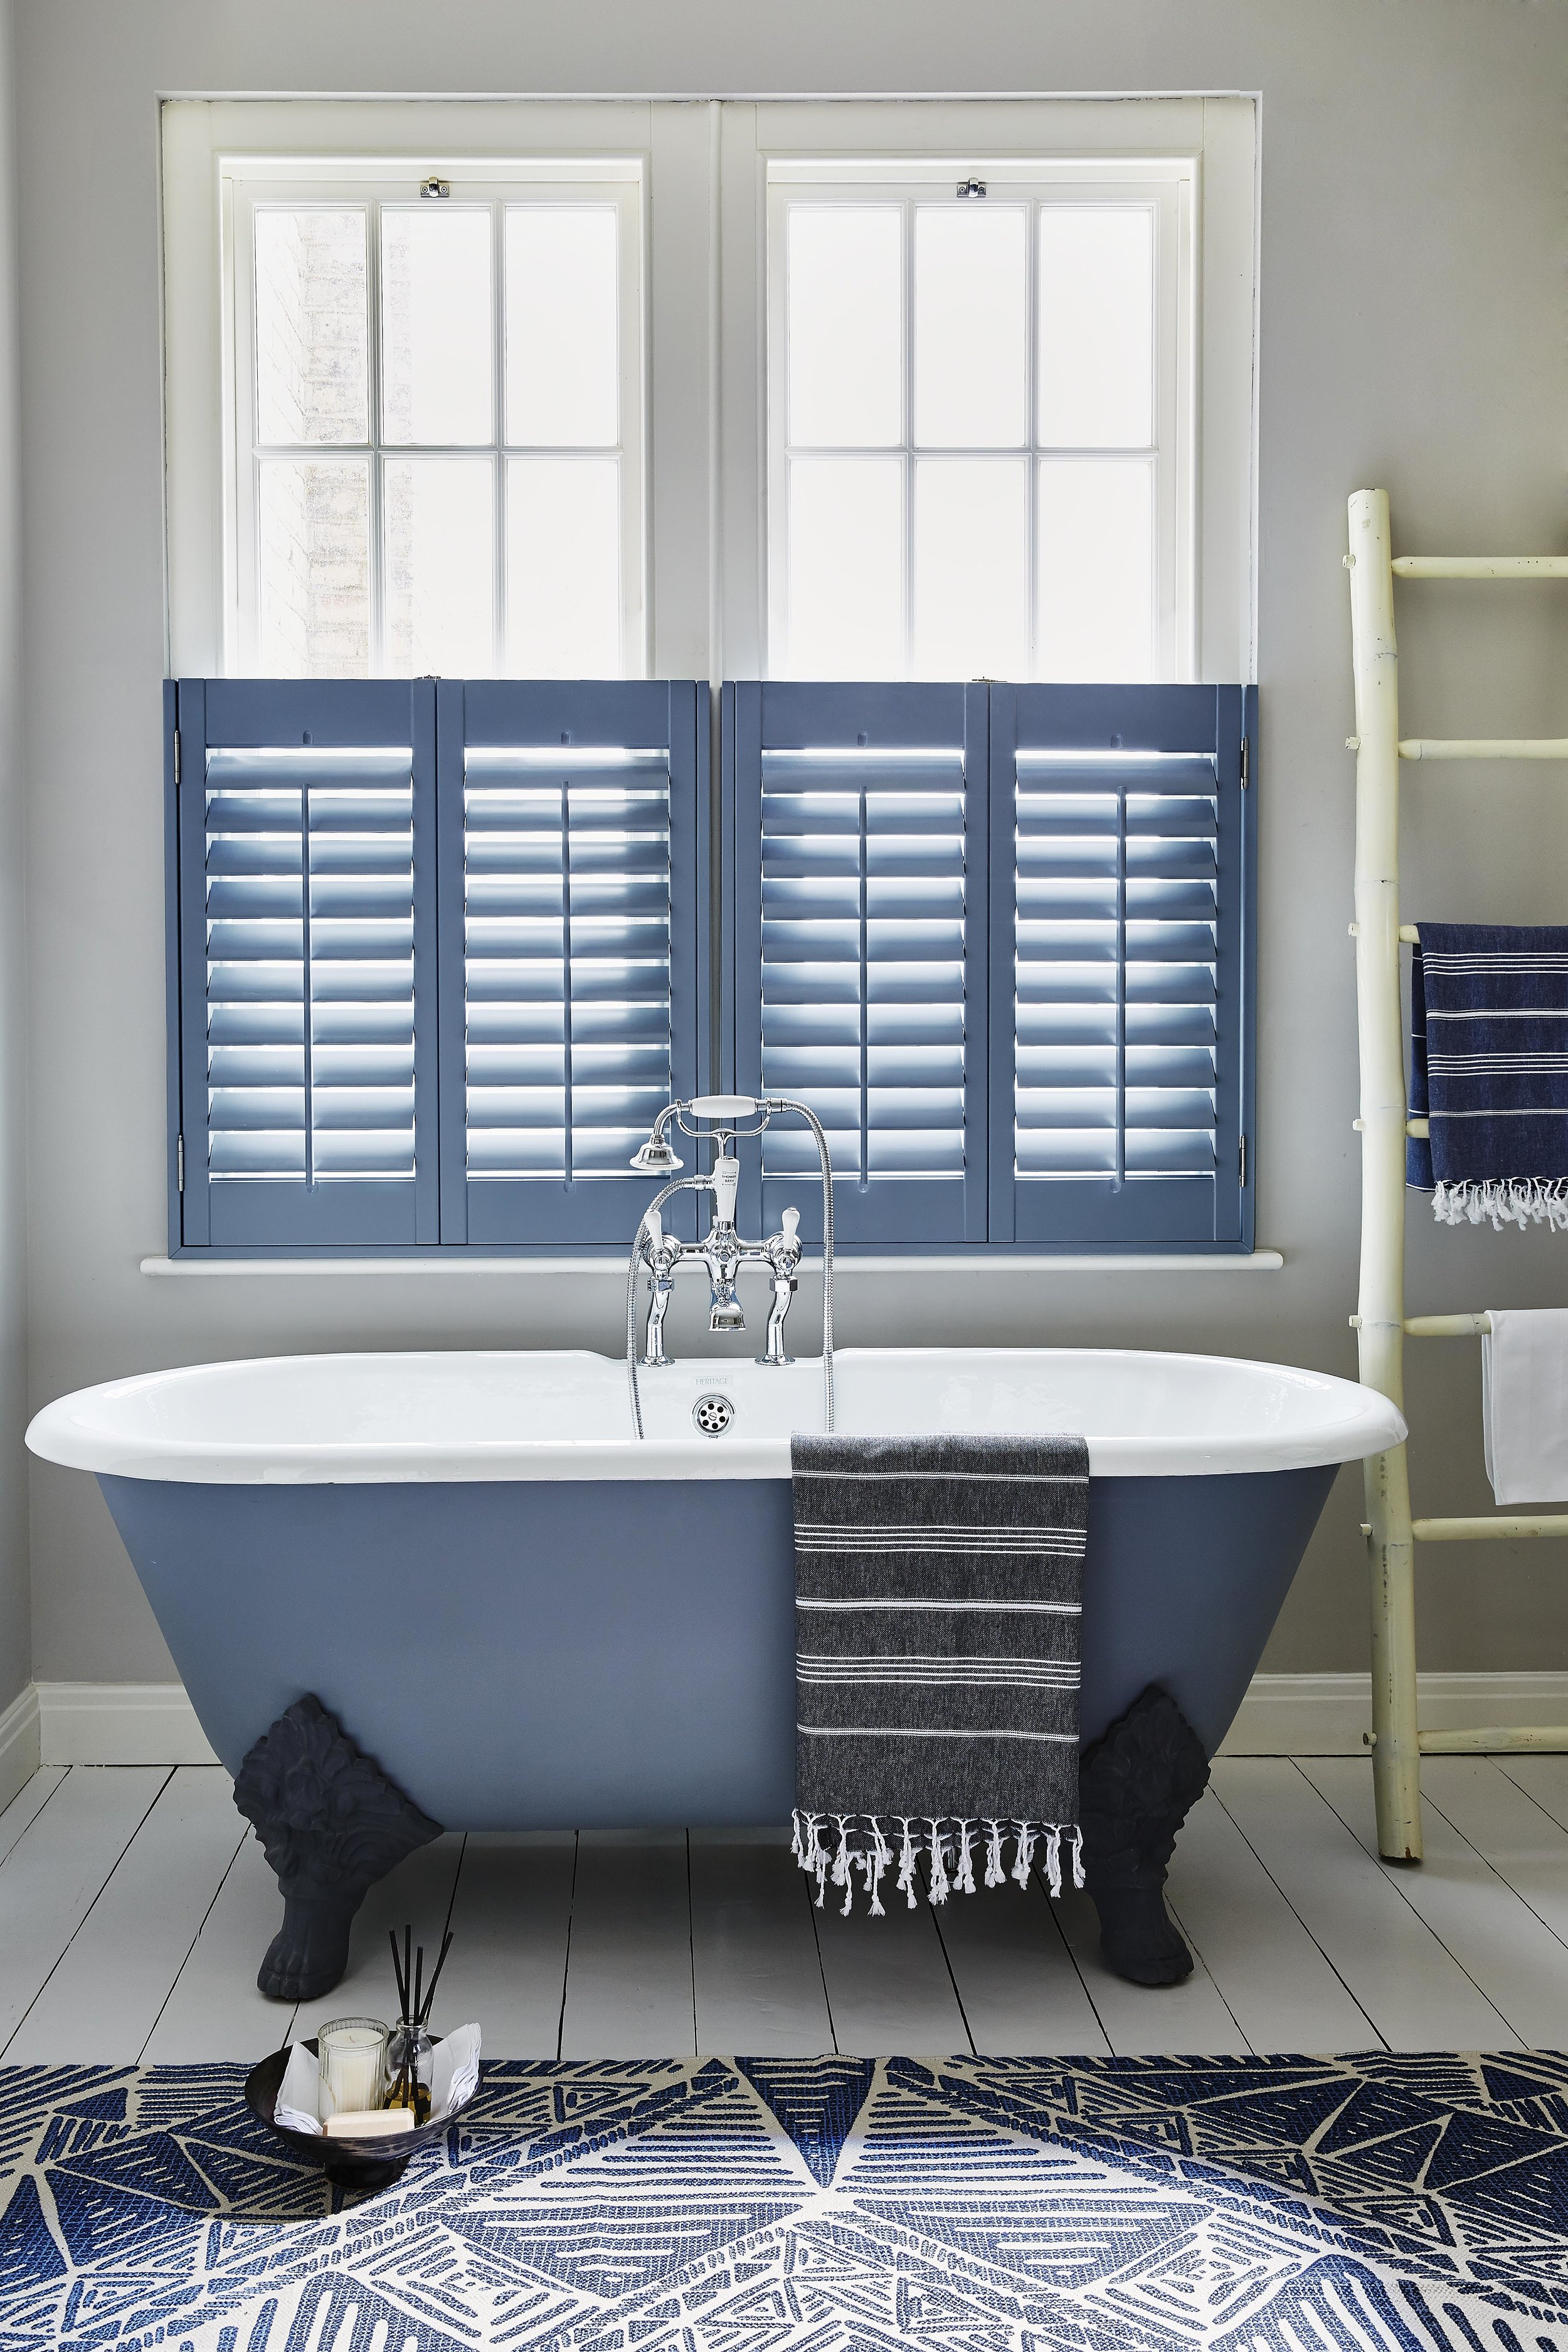 Shutterly Fabulous - Blue Cafe Bathroom.jpg